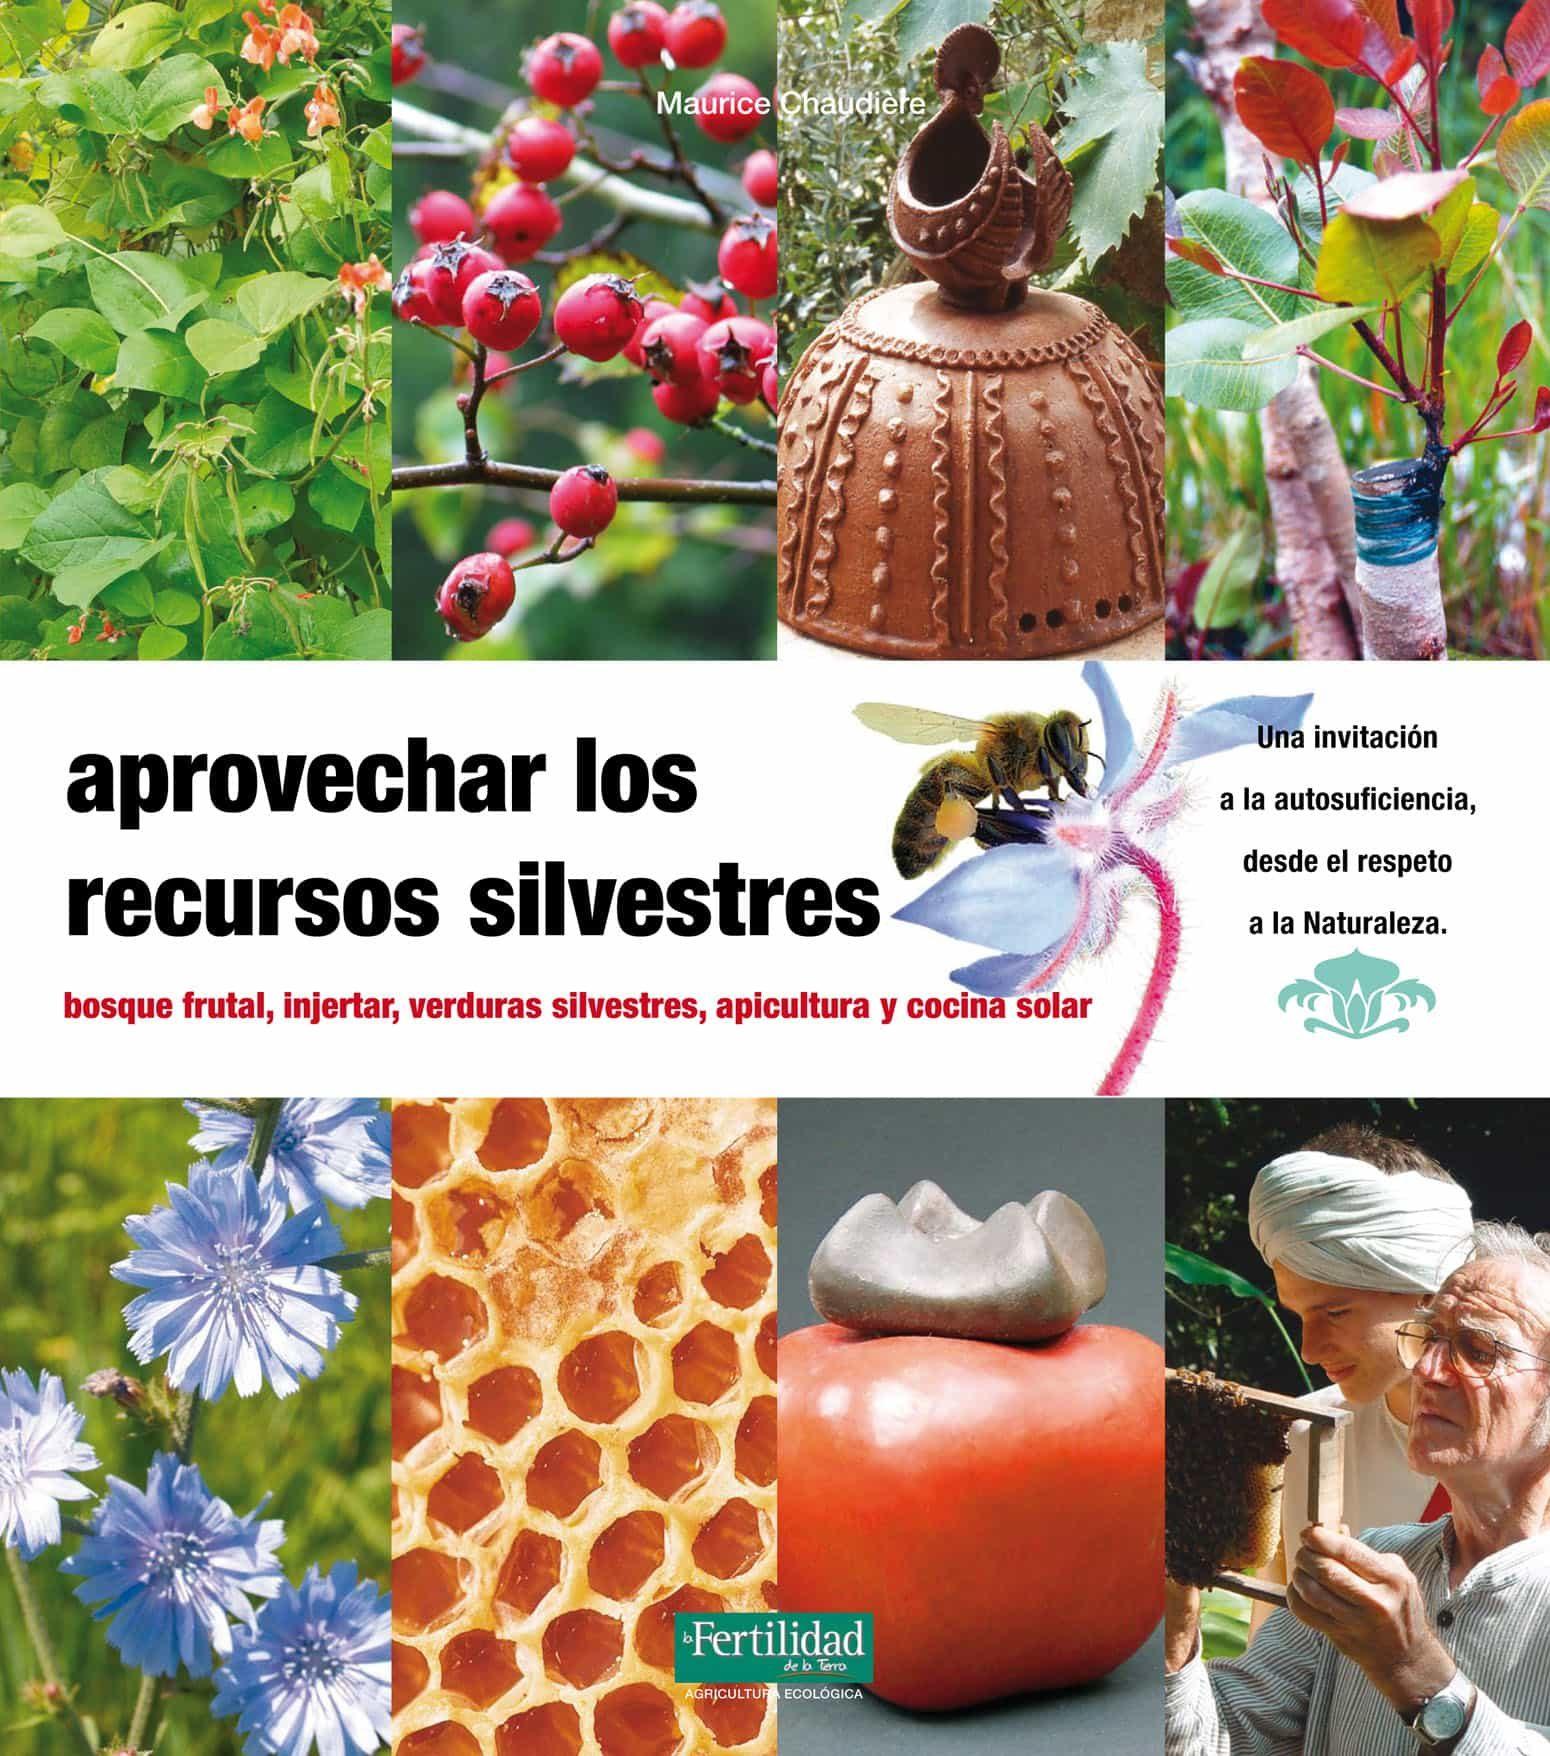 aprovechar los recursos silvestres: bosques frutales, injertar, v erduras silvestres, apicultura y cocina-maurice chaudiere-9788493828936